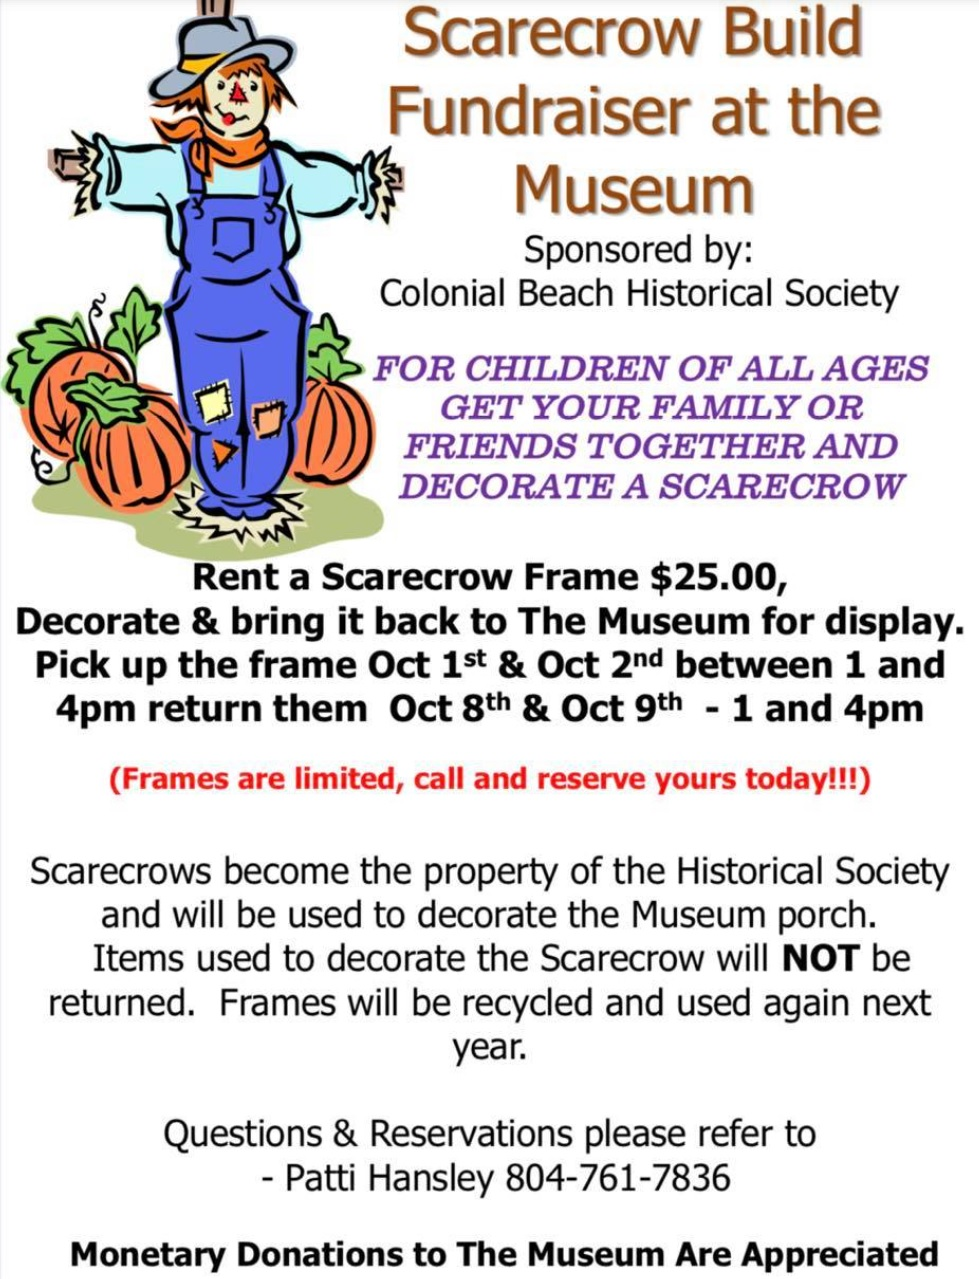 Scarecrow Fundraiser flyer